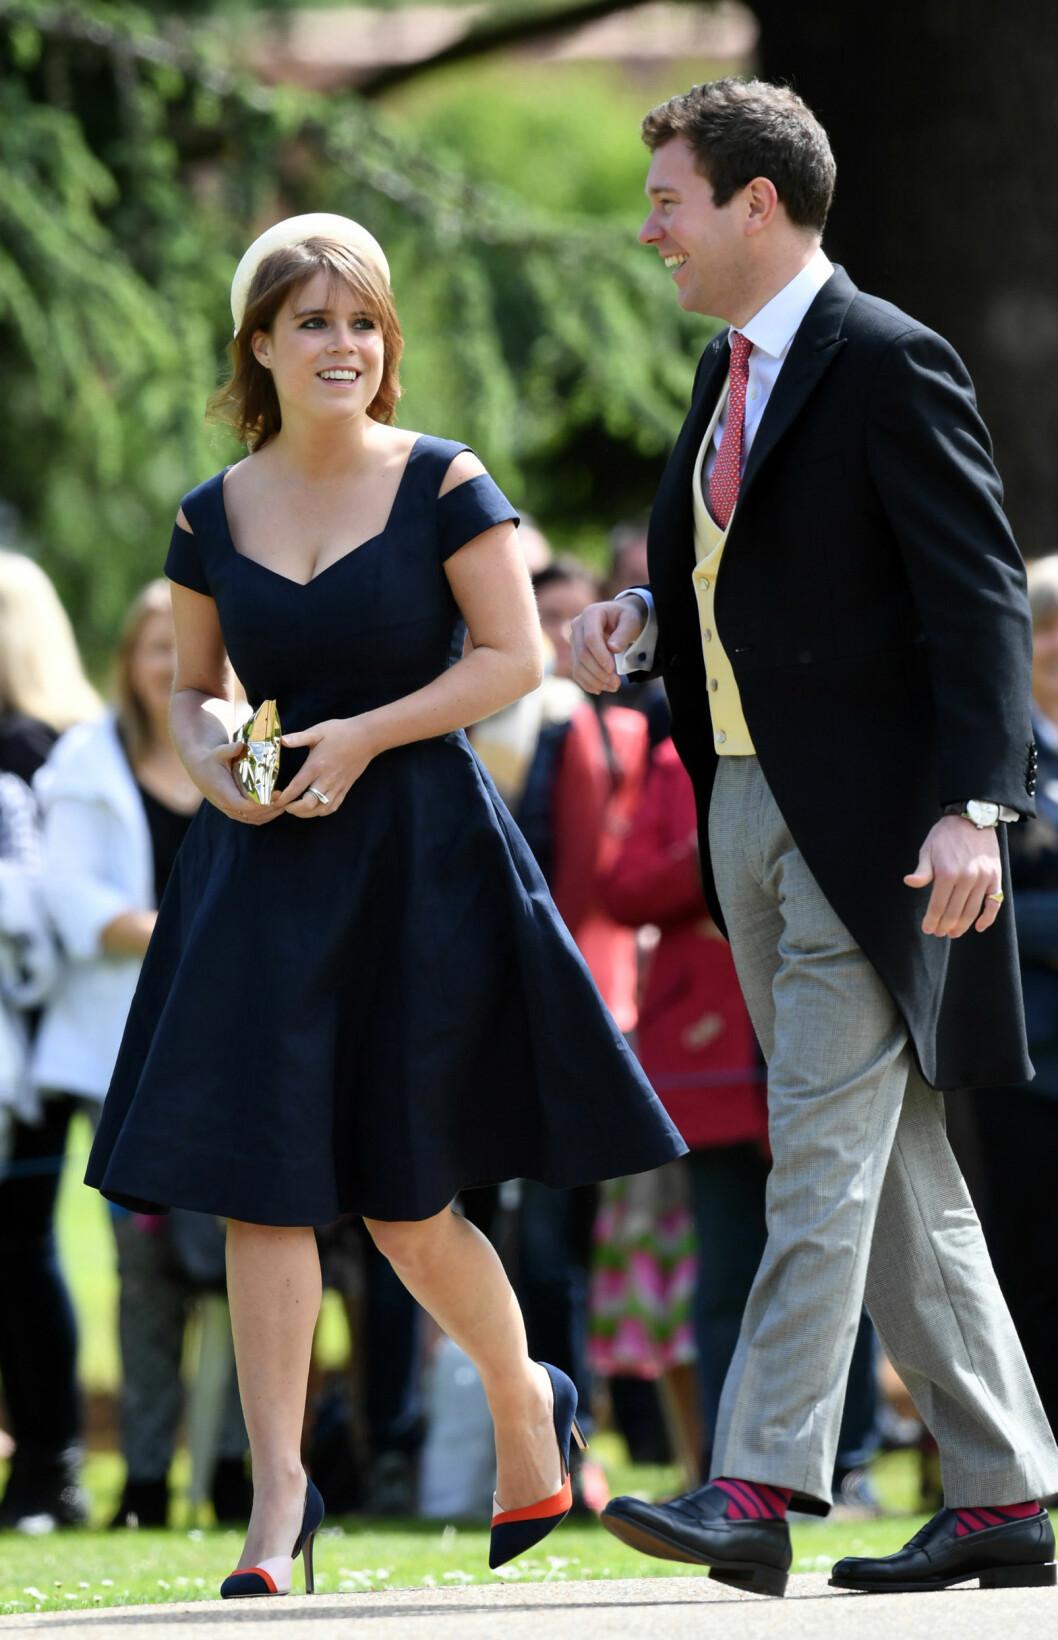 SMIL: Eugenie og Jack i bryllupet til Pippa Middleton - hertuginne Kates søster - og James Matthews i mai 2017. FOTO: NTB Scanpix